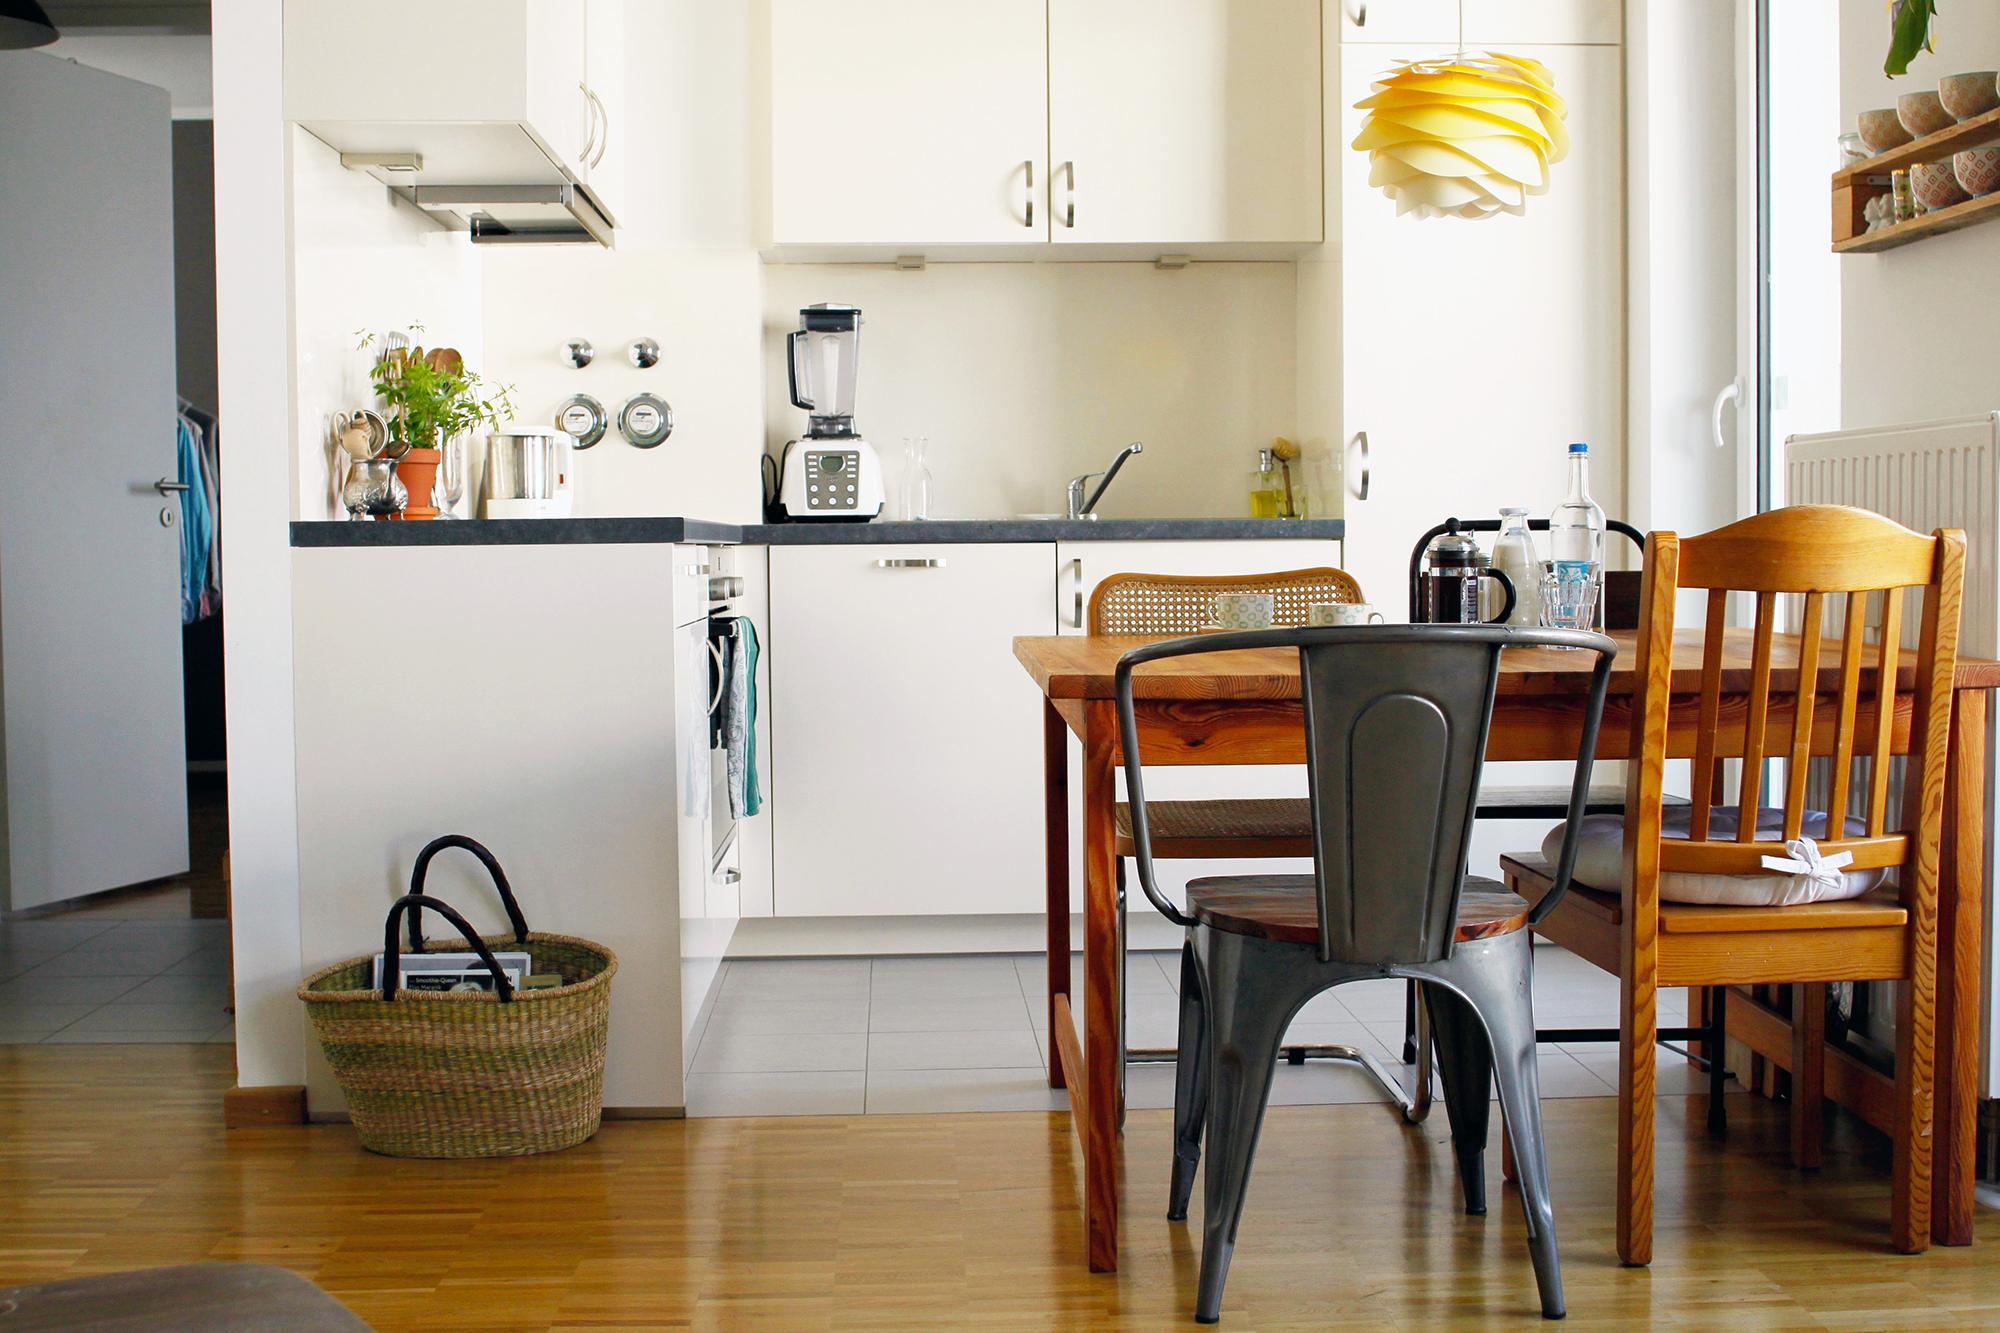 Kuchenboden Bilder Ideen Couch